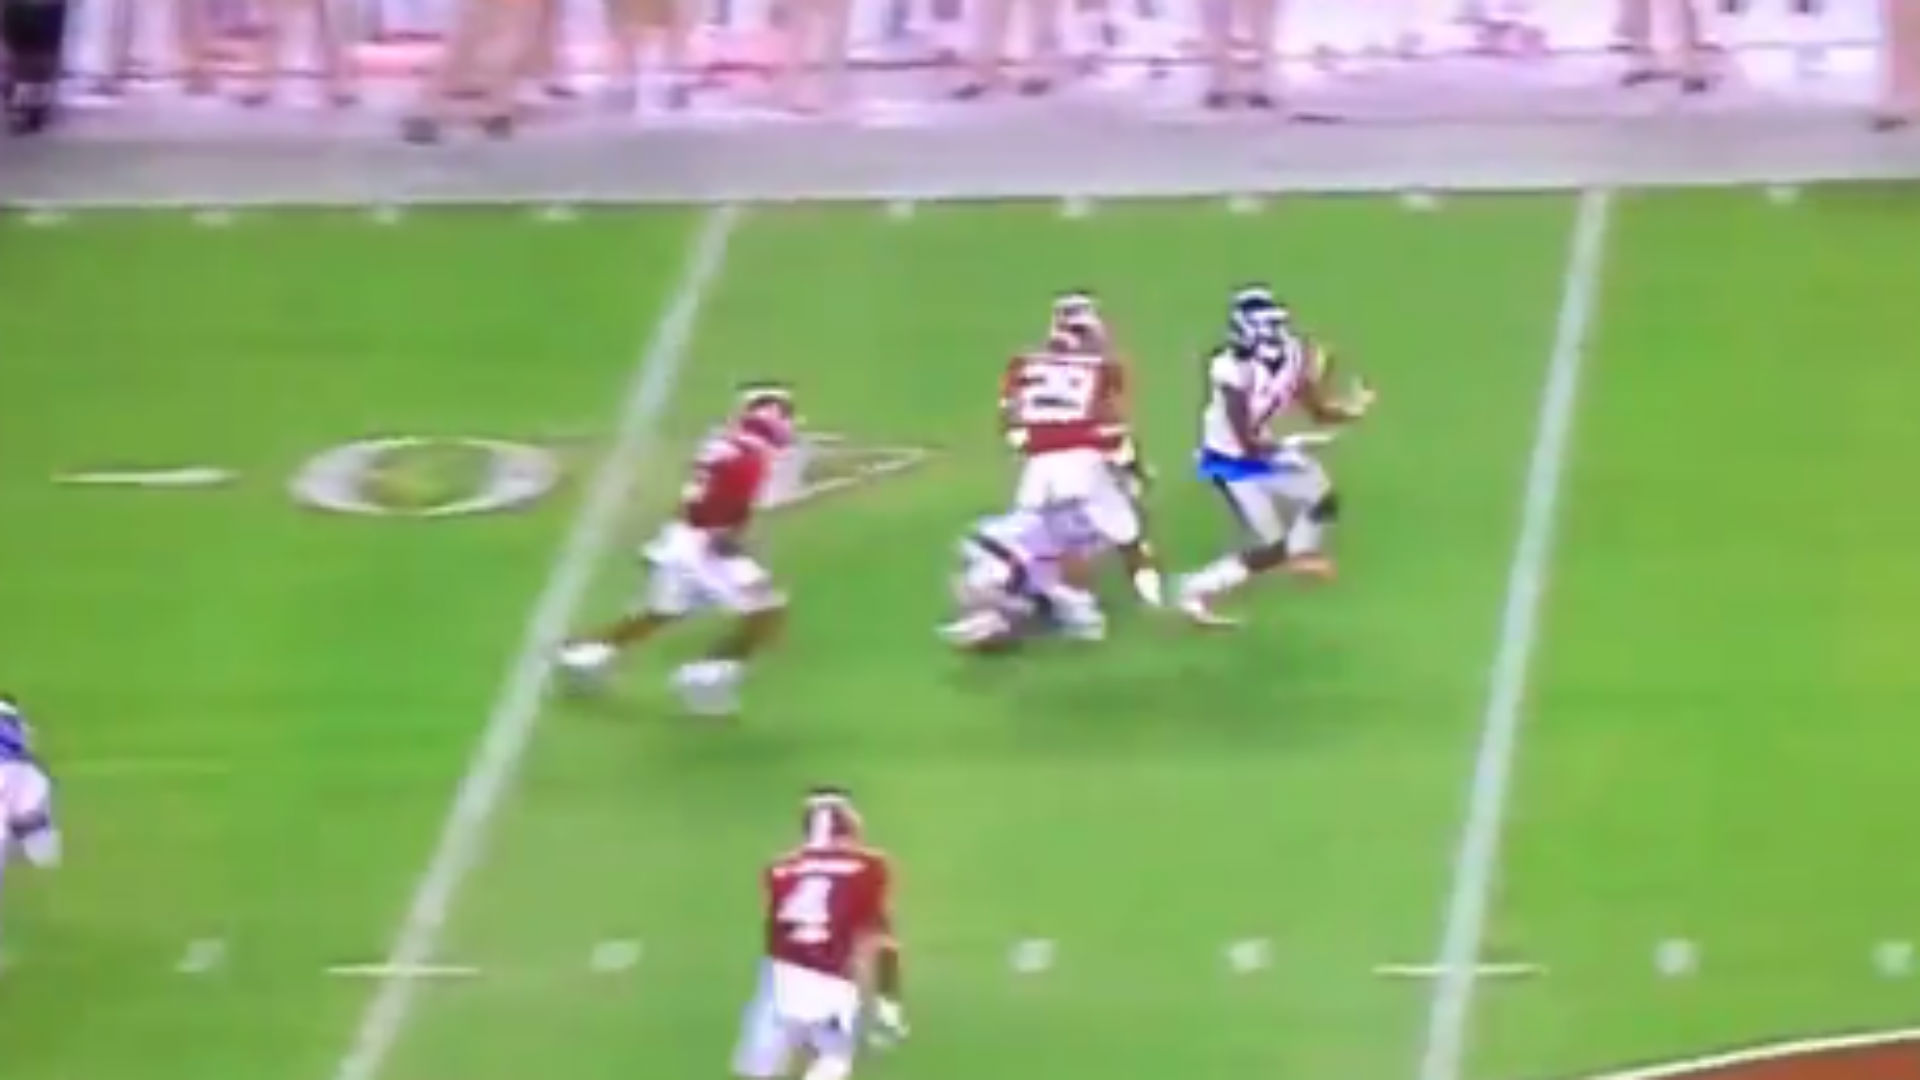 ole-miss-touchdown-ftr-091915.jpg